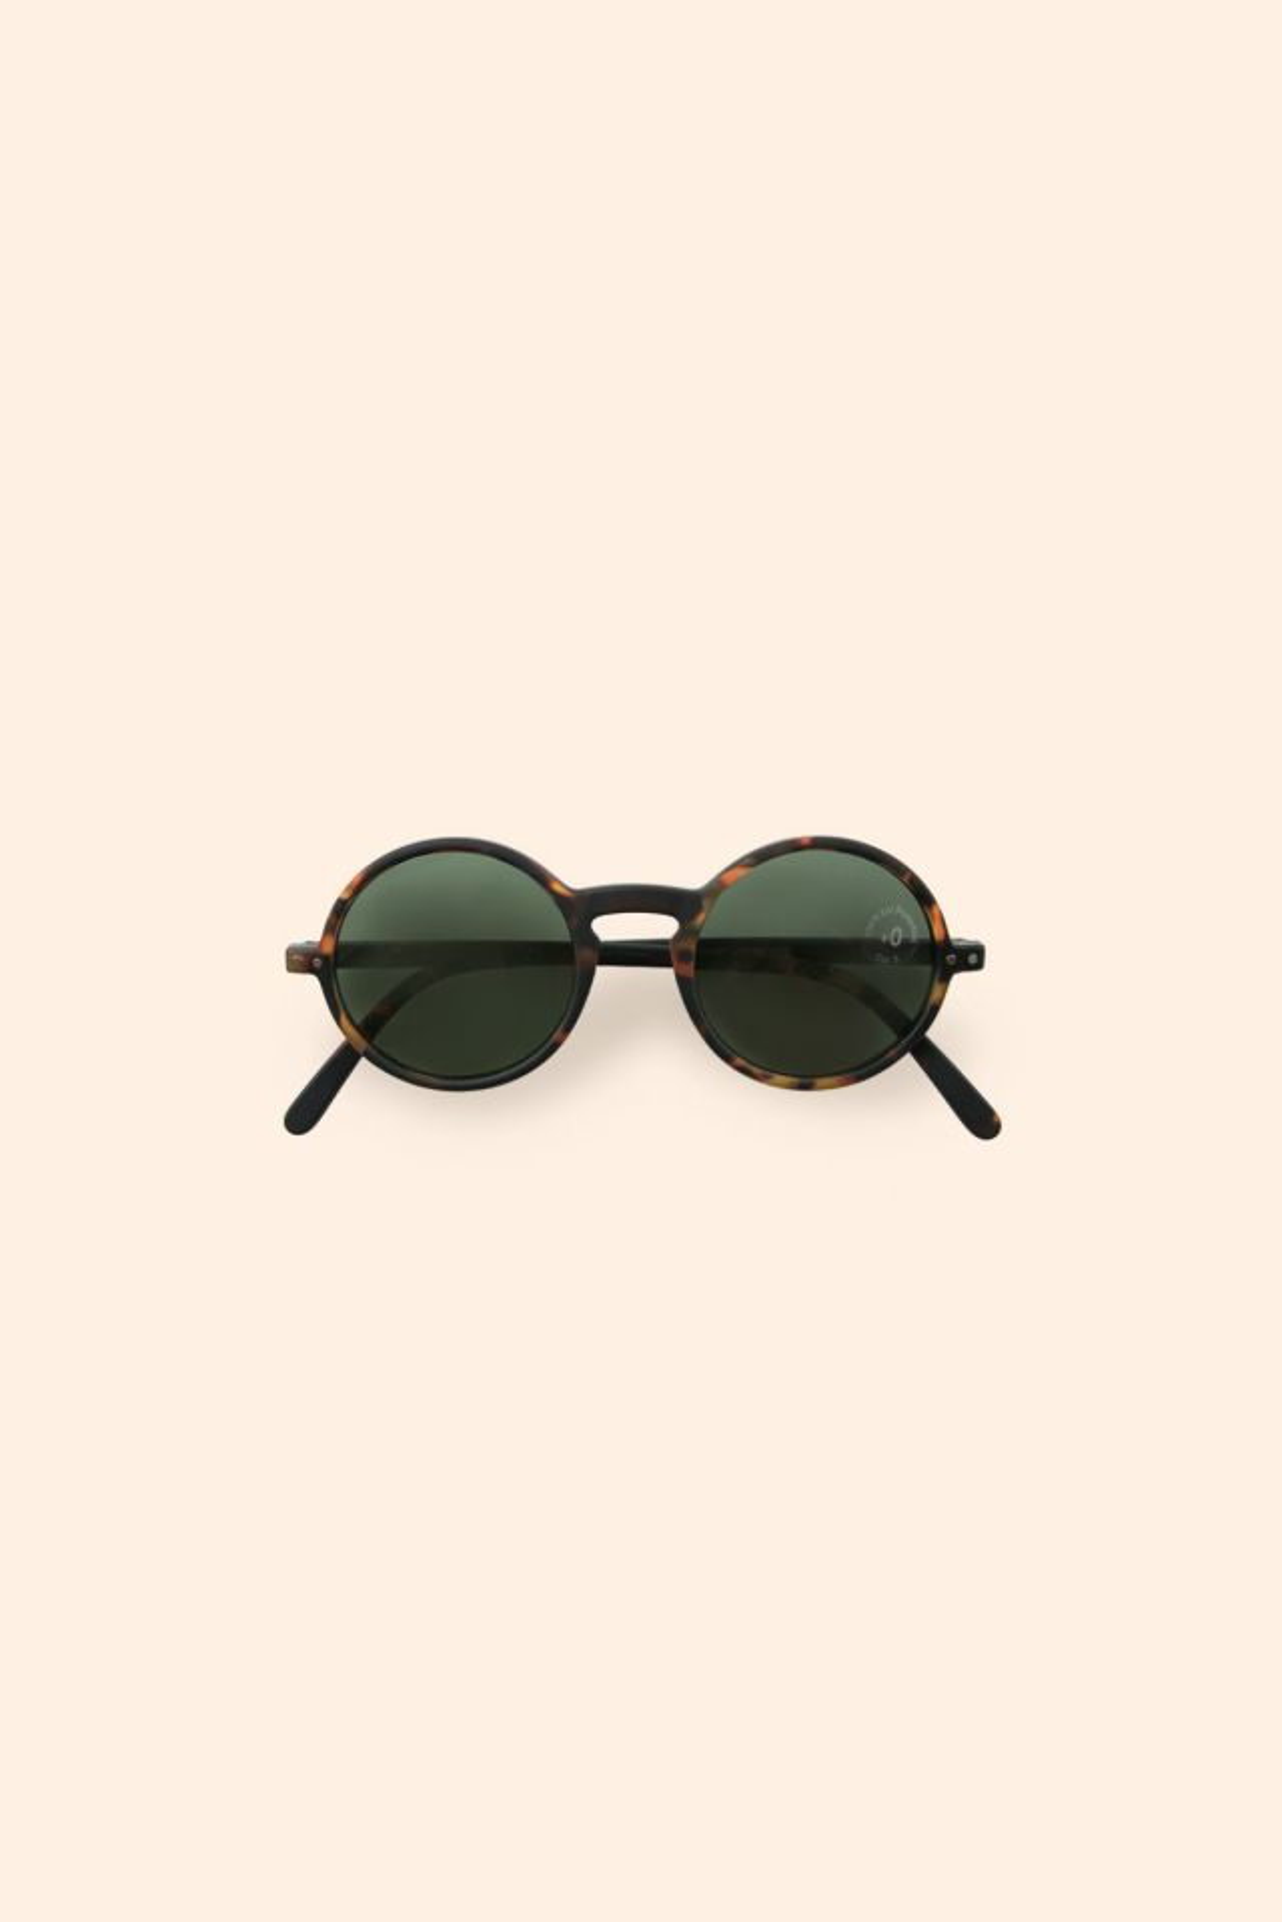 IZIPIZI ADULT G SUN Tortoise Green Lenses +0